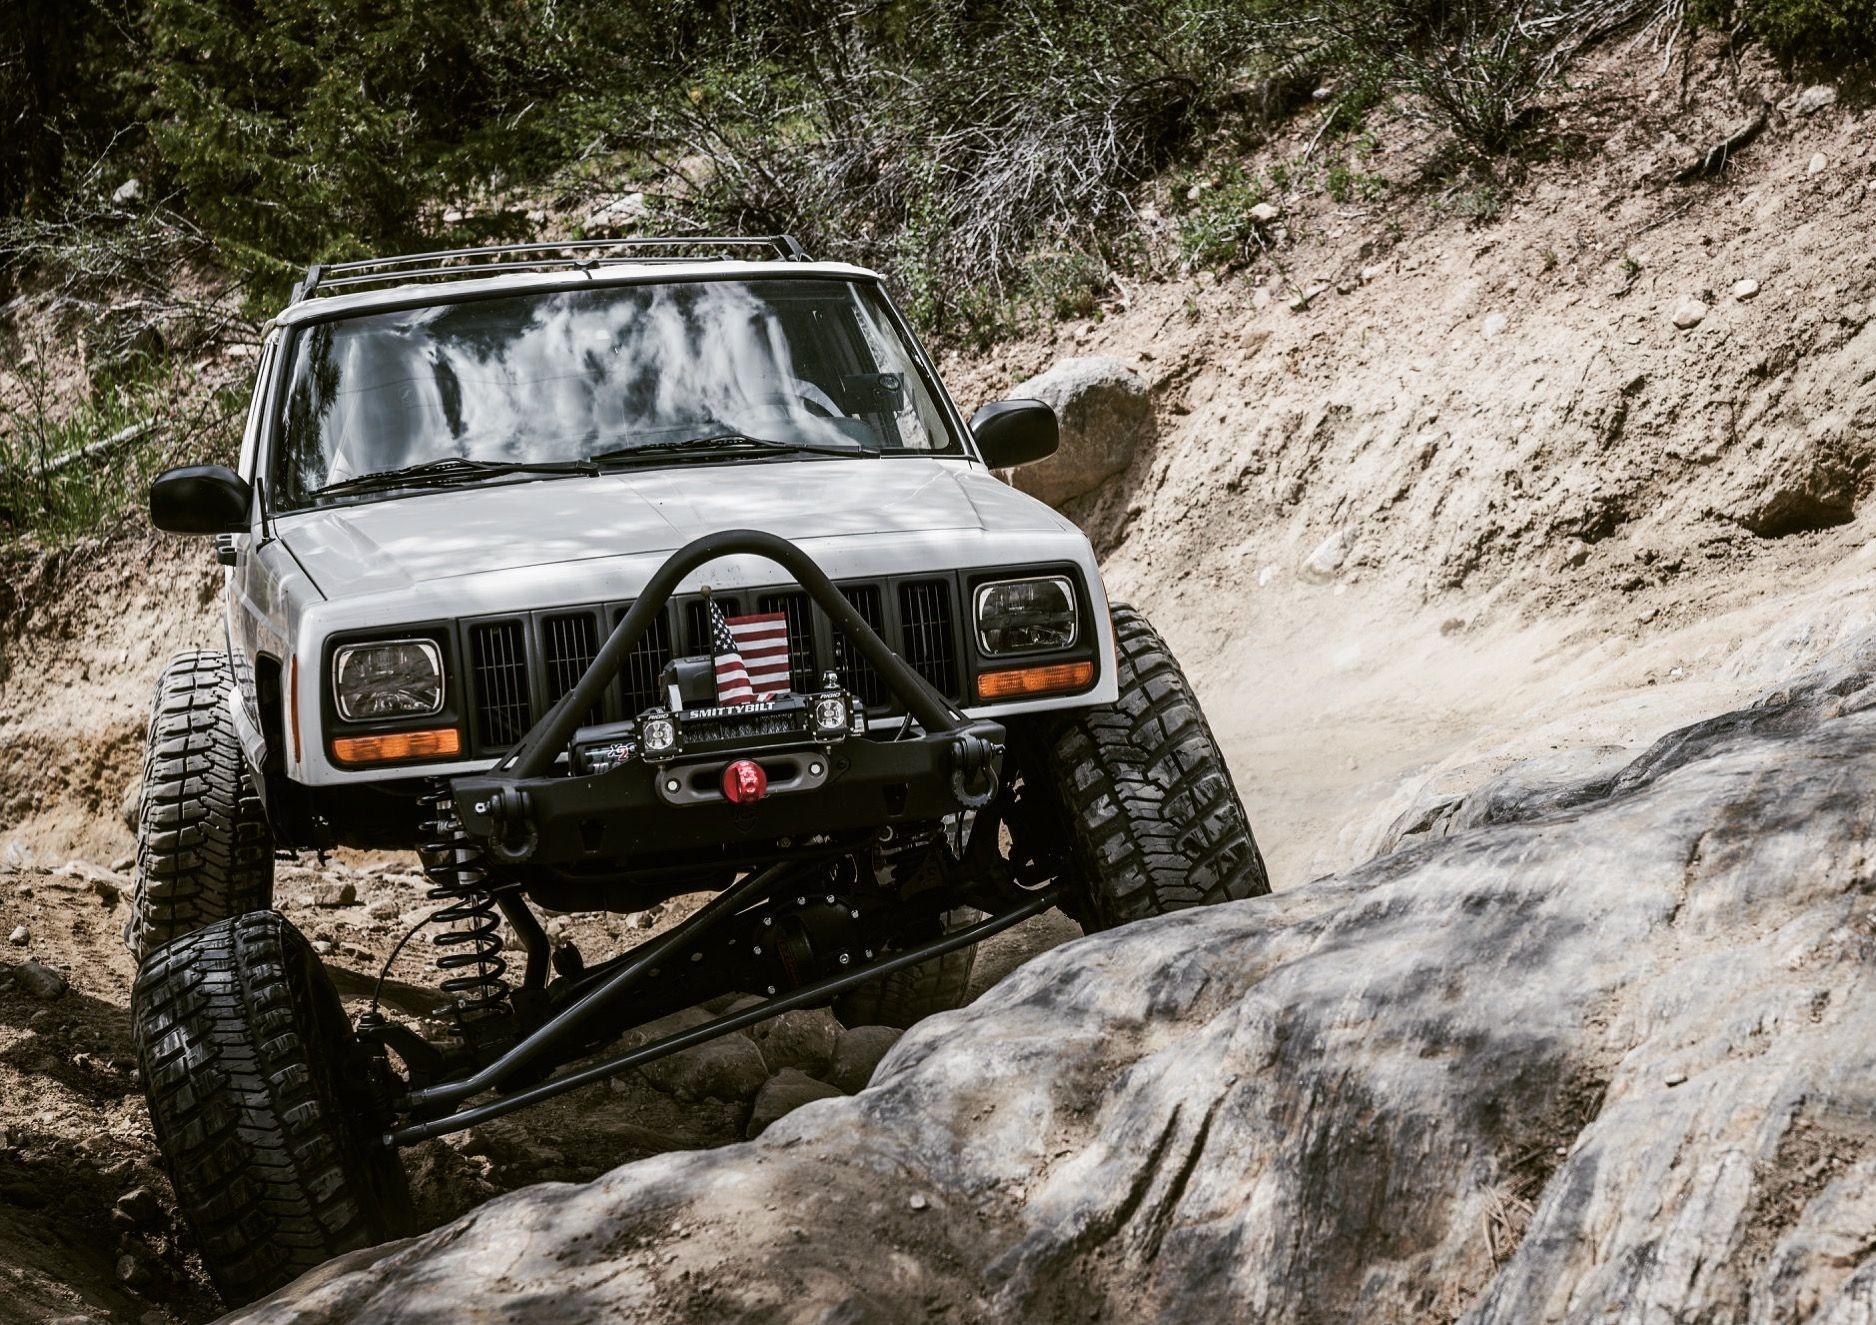 Jk Axle Swap Cherokee Jeep Cherokee Xj Jeep Xj Jeep